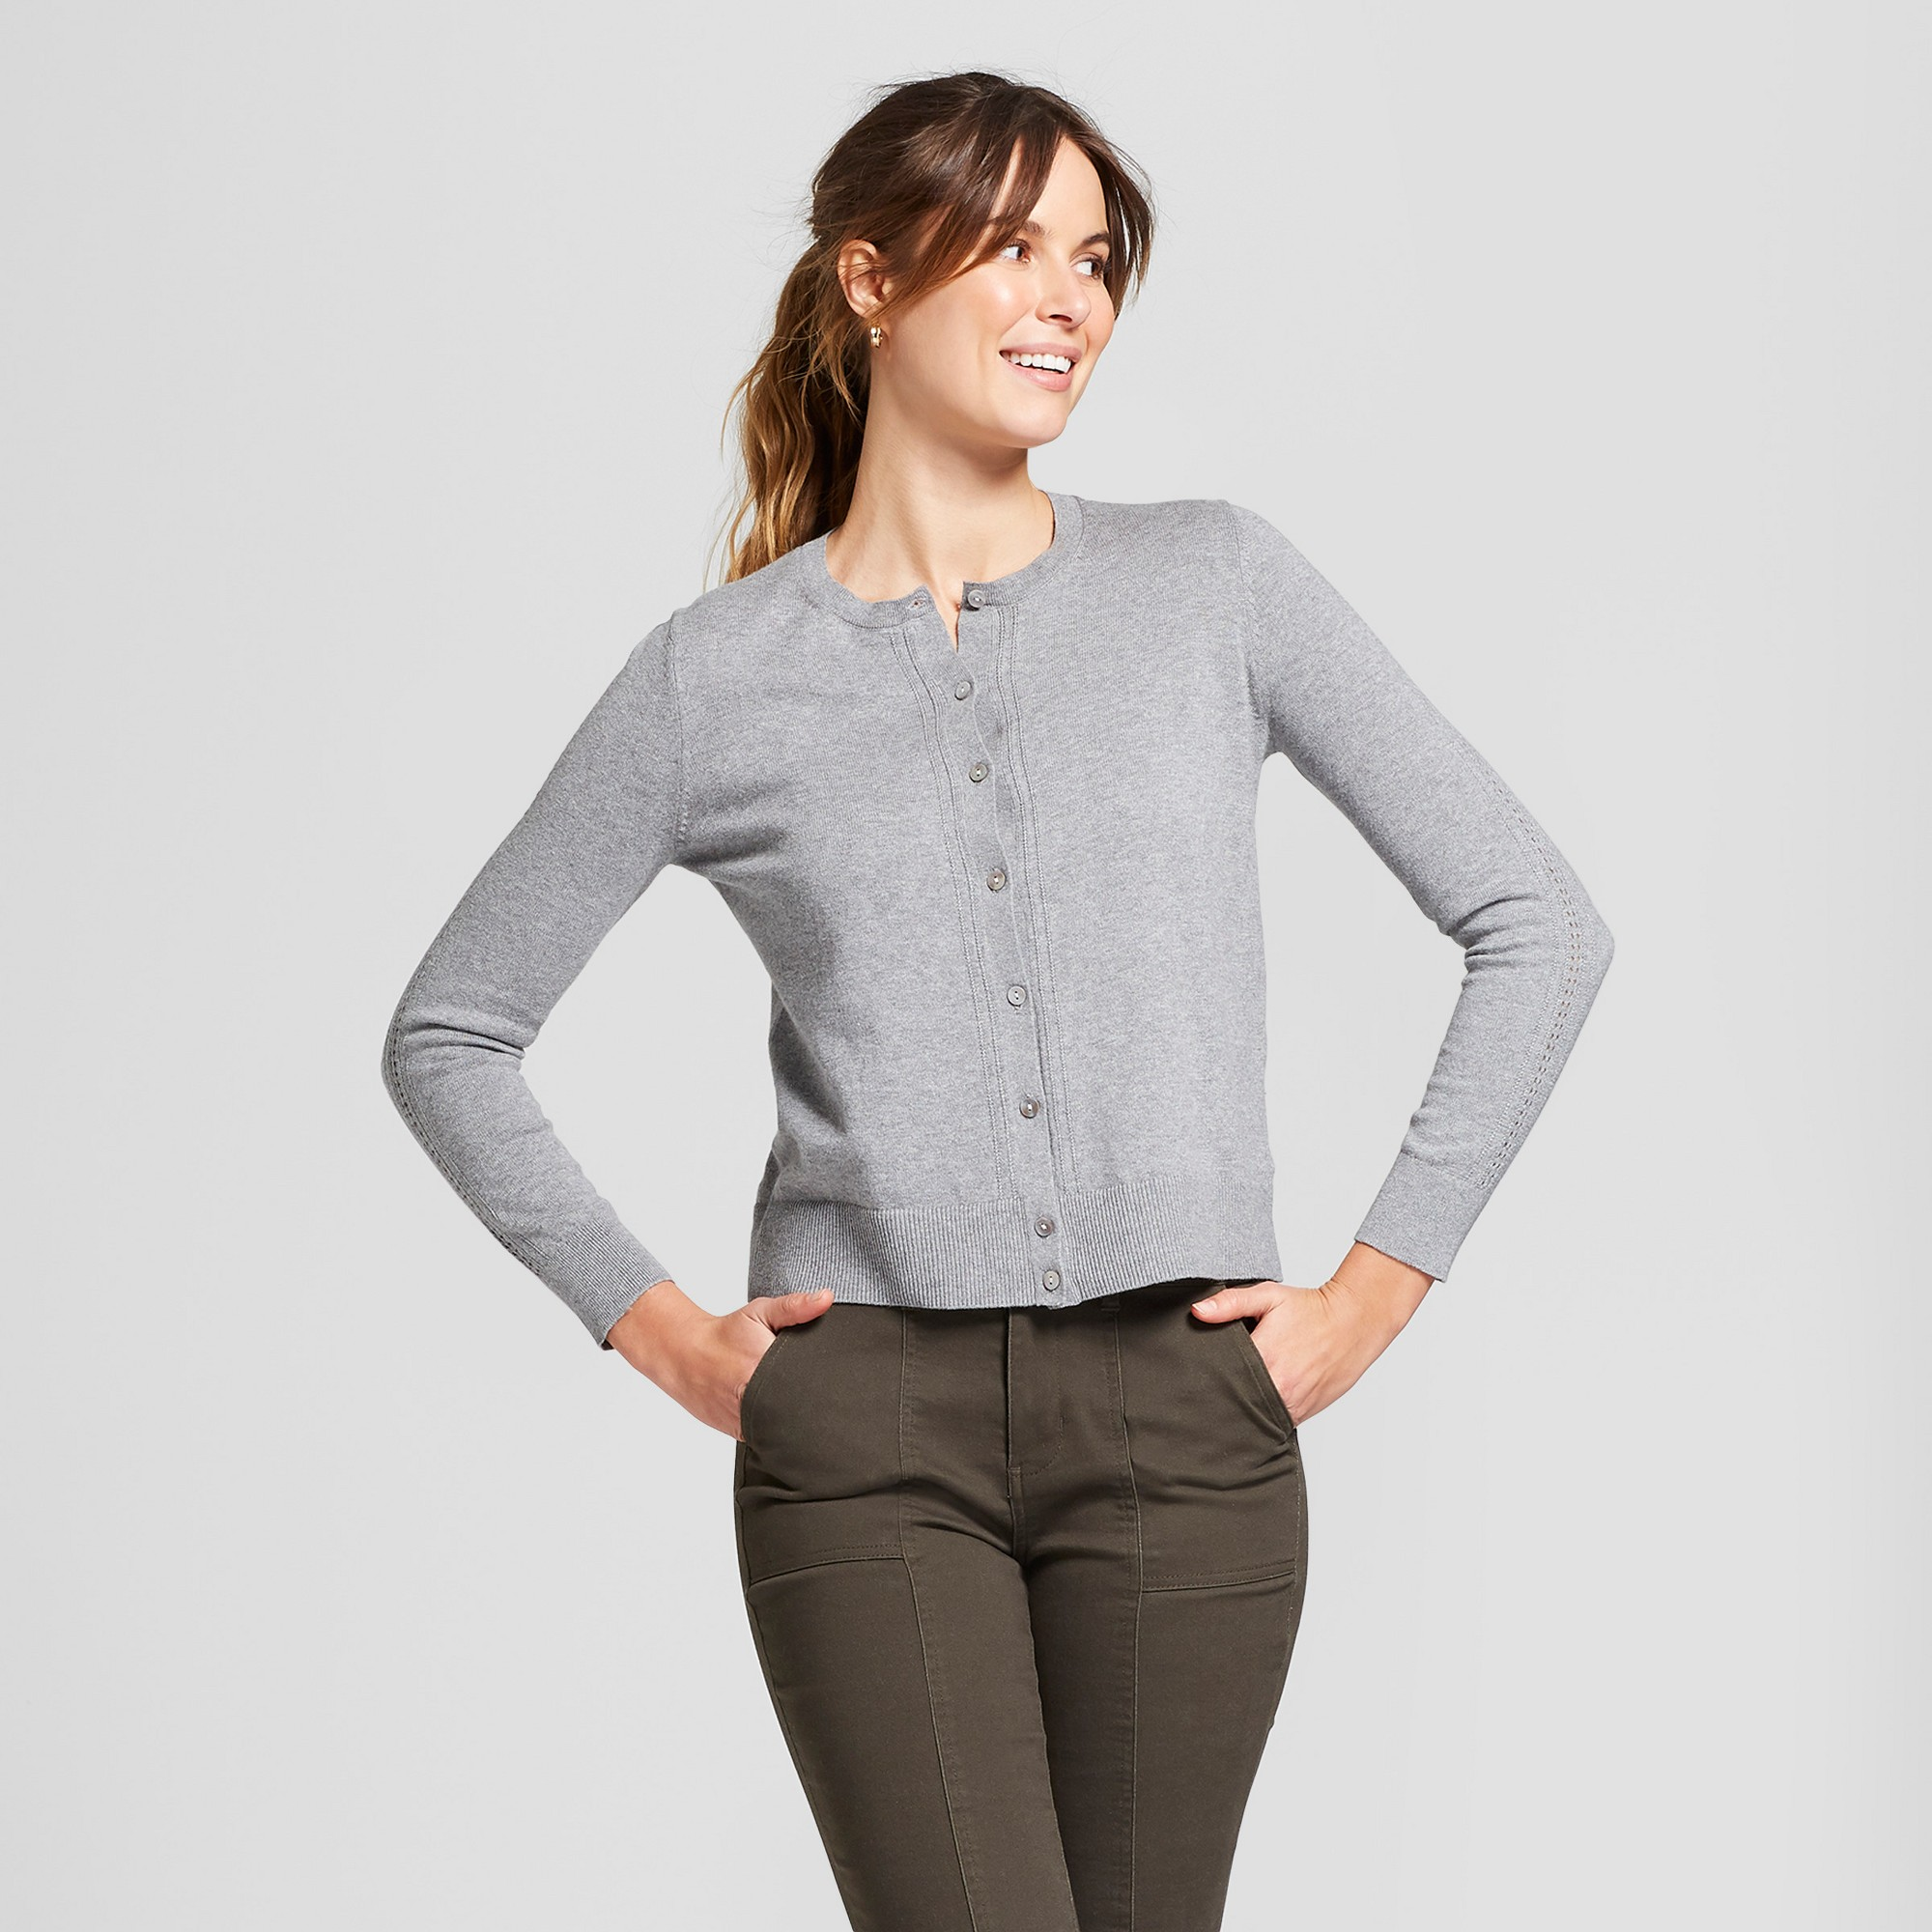 Women's Long Sleeve Crewneck Cardigan - A New Day Medium Heather Gray S